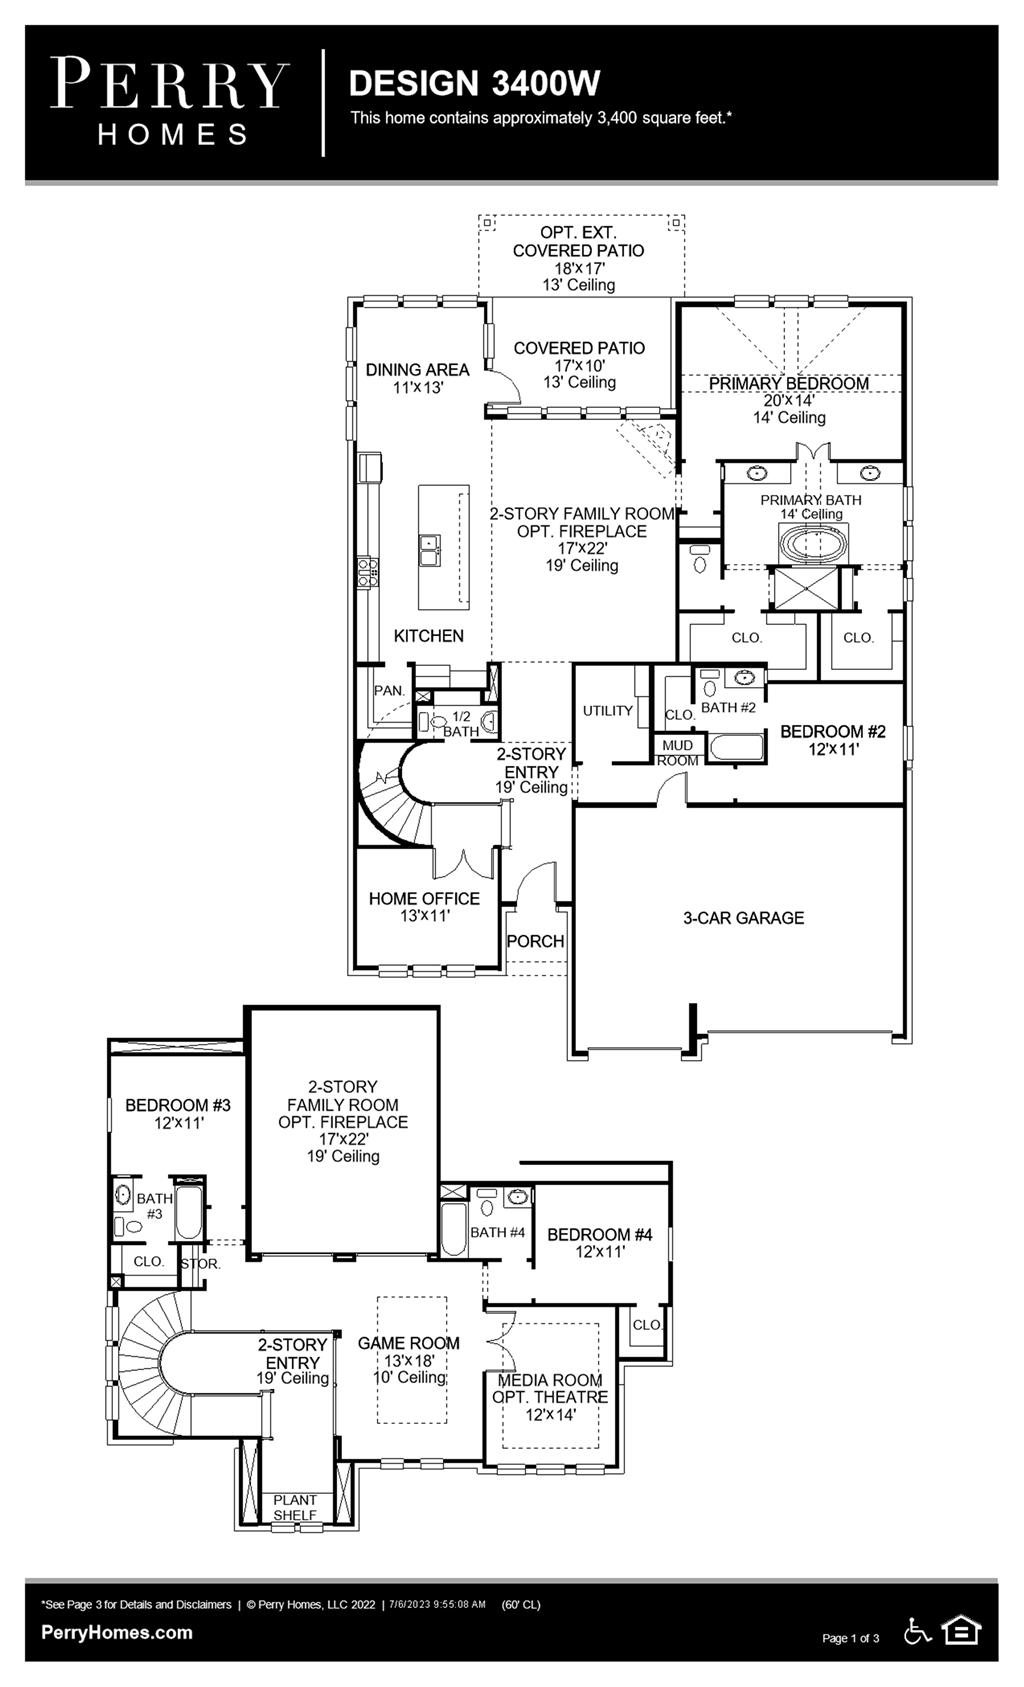 Floor Plan for 3400W